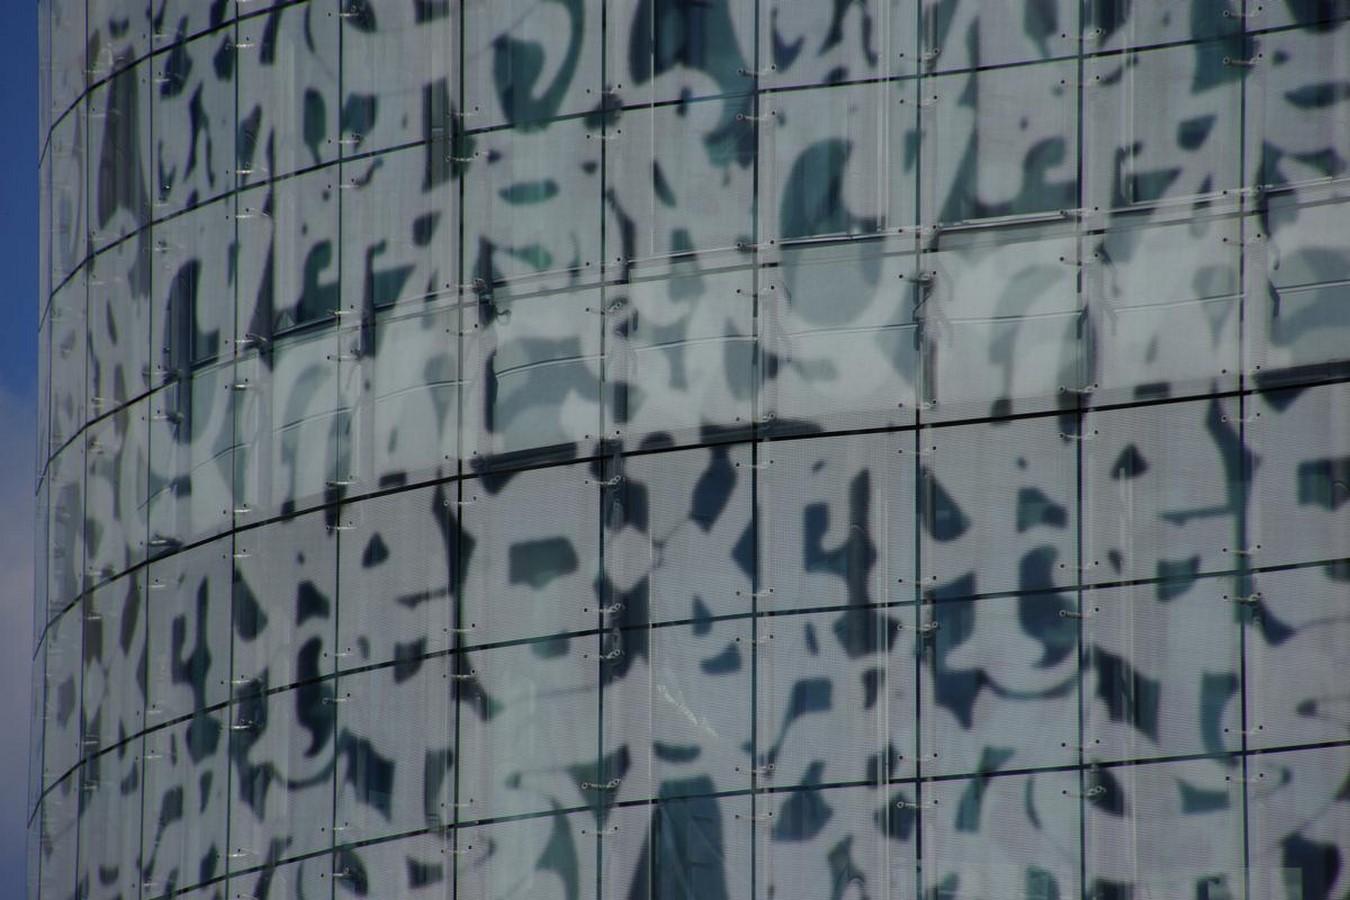 10 Examples of Innovative facade design solutions - Sheet32